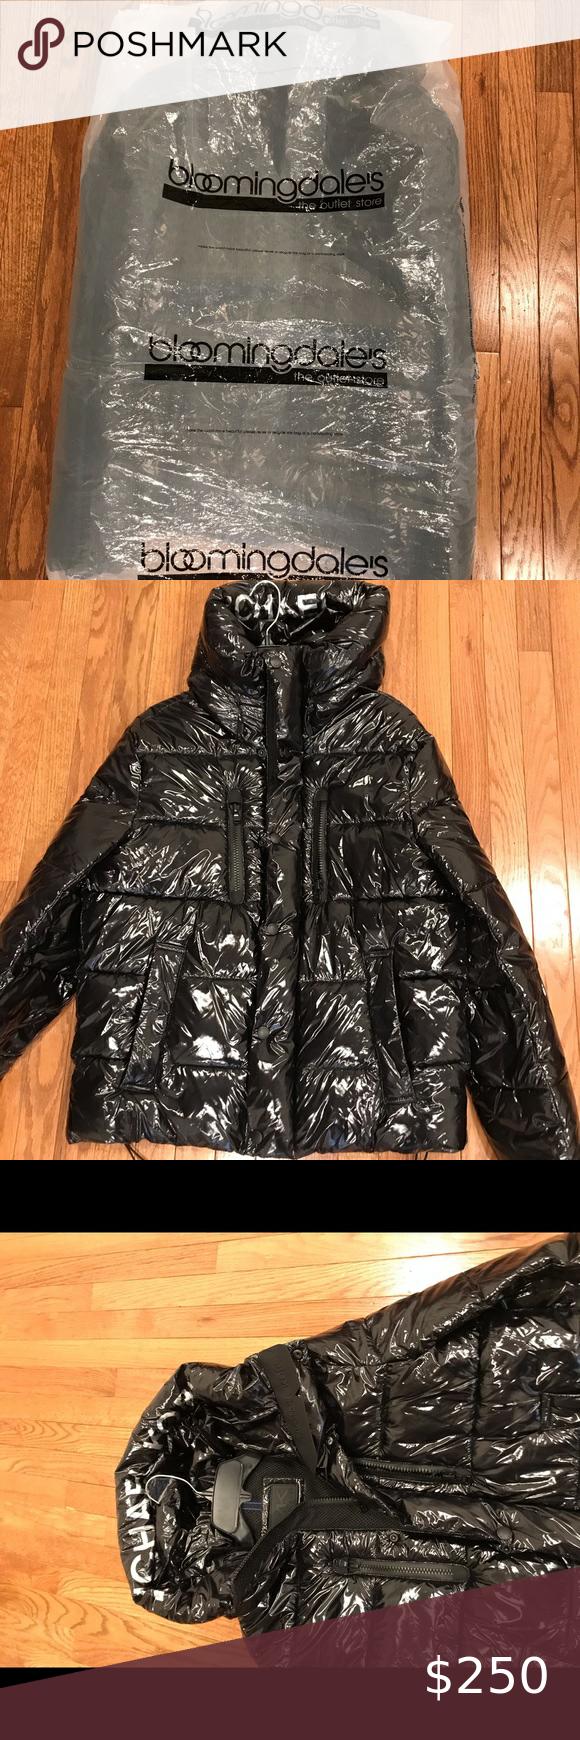 Men S Black Michael Kors Jacket Michael Kors Jackets Michael Kors Kor [ 1740 x 580 Pixel ]